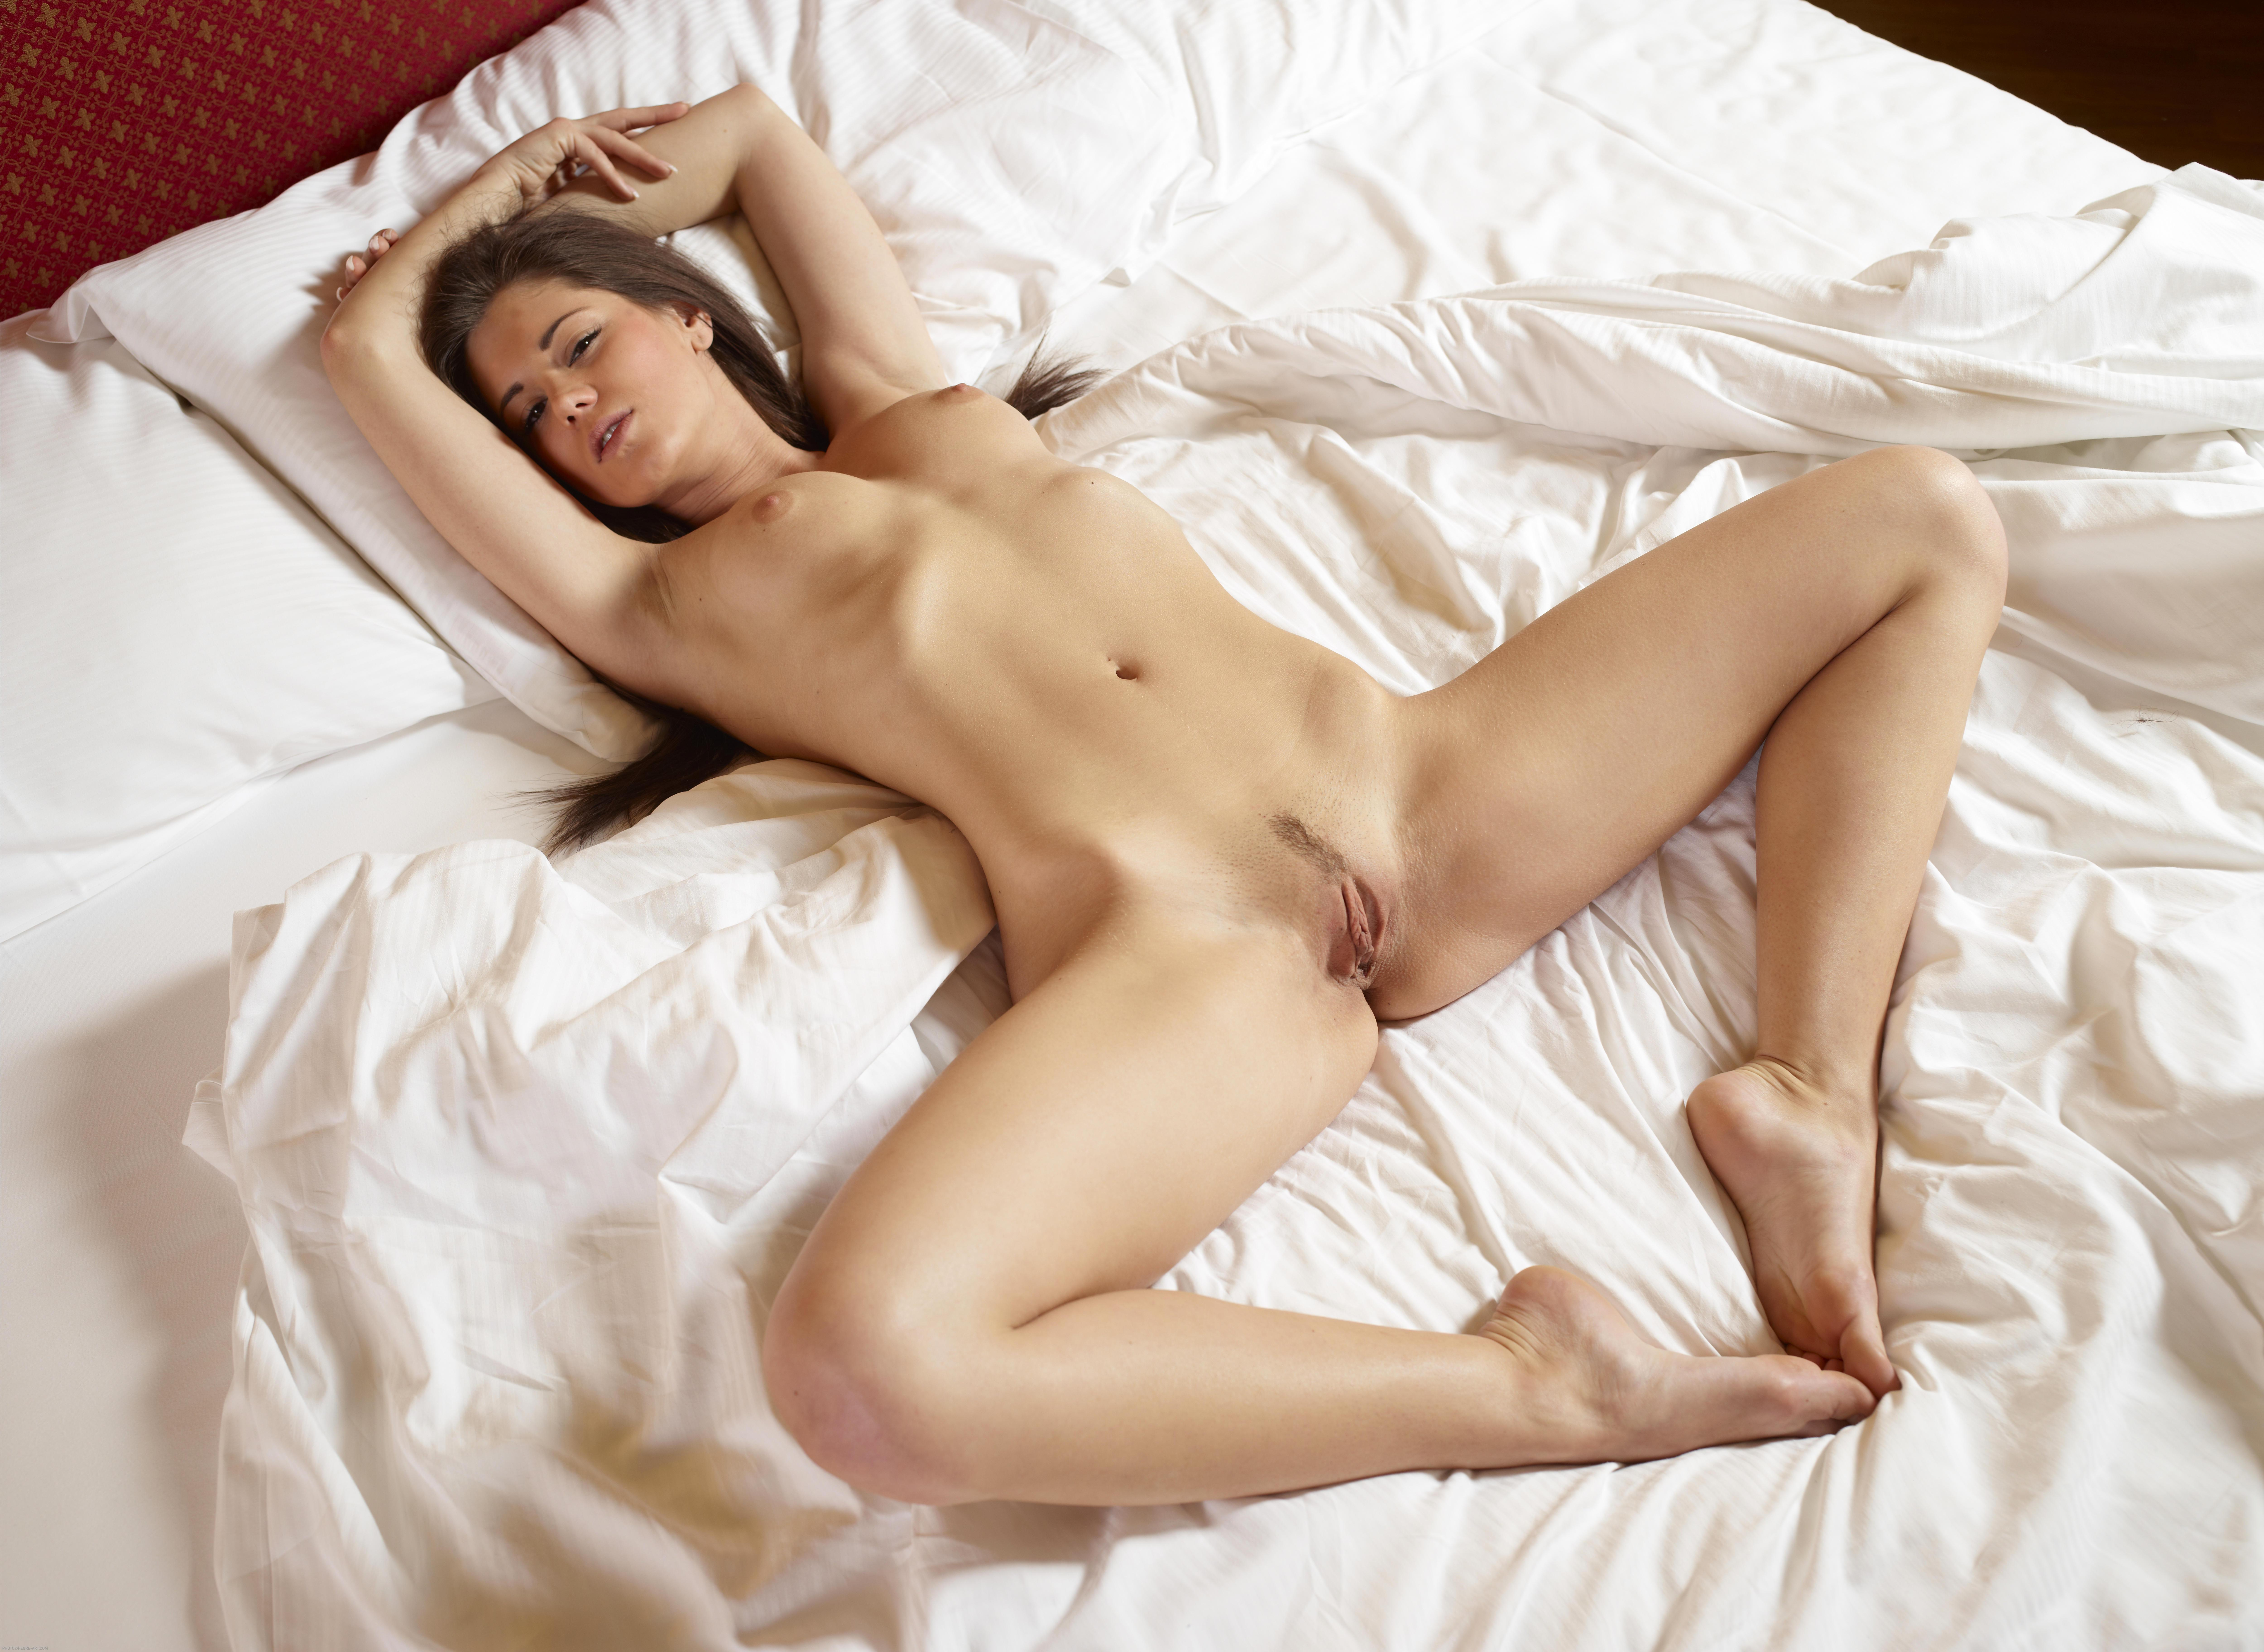 Little Caprice Hegre Nude Gallery My Hotz Pic